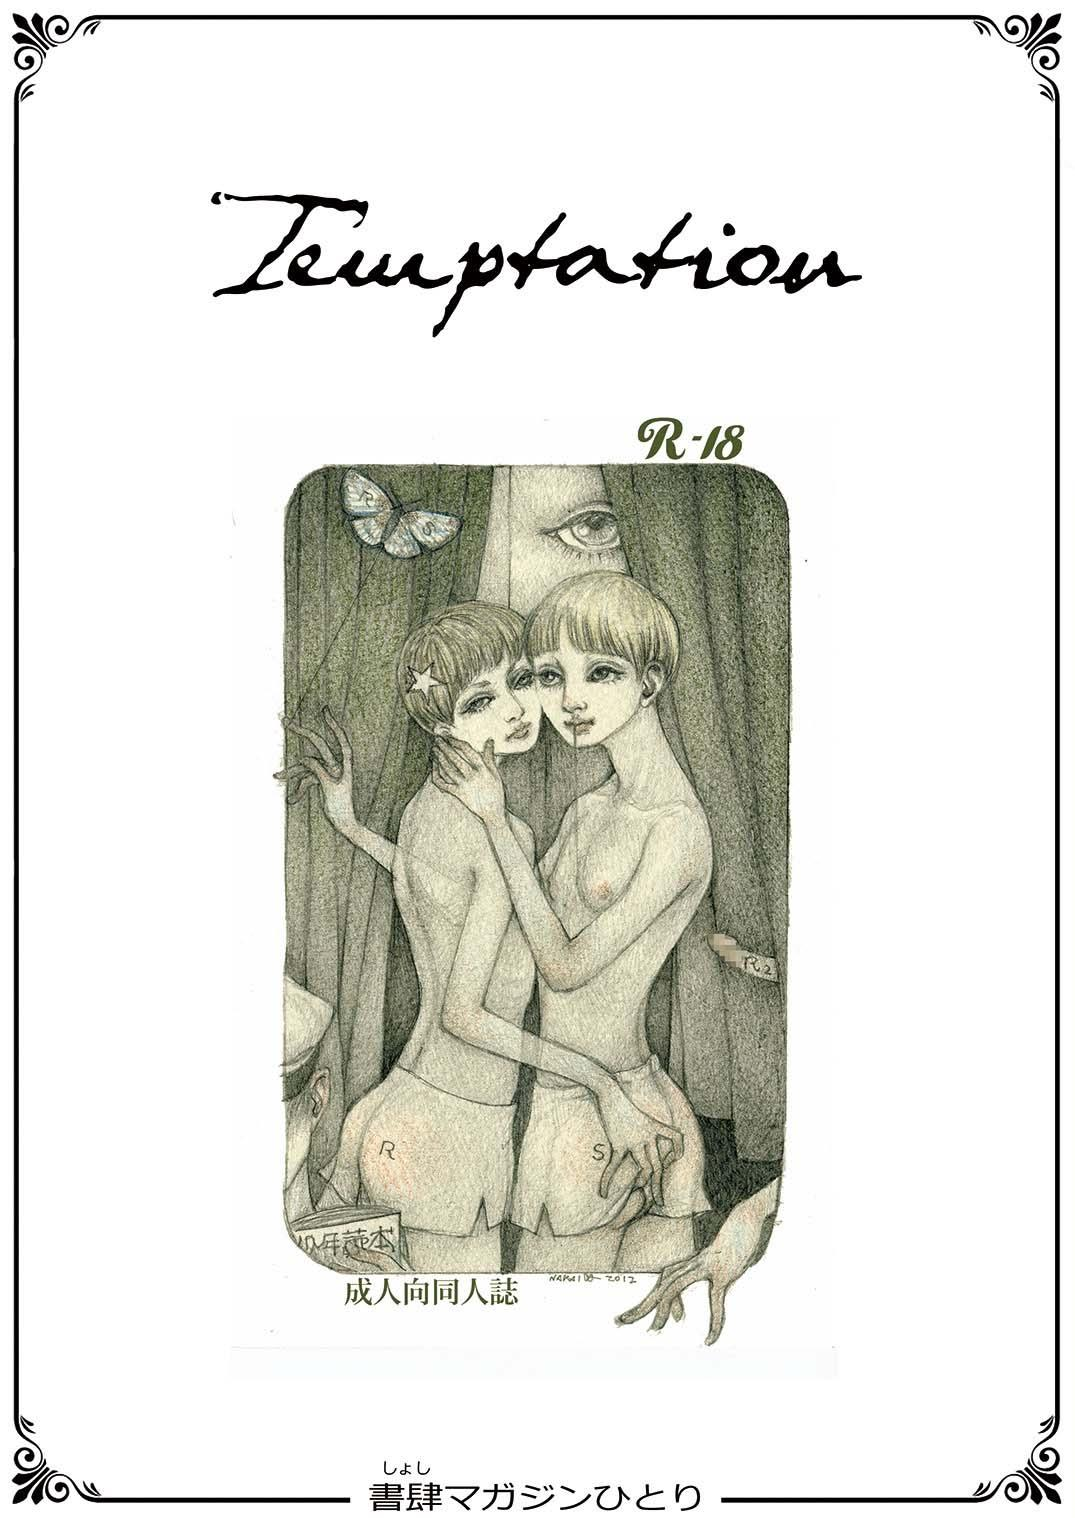 Temptation 0